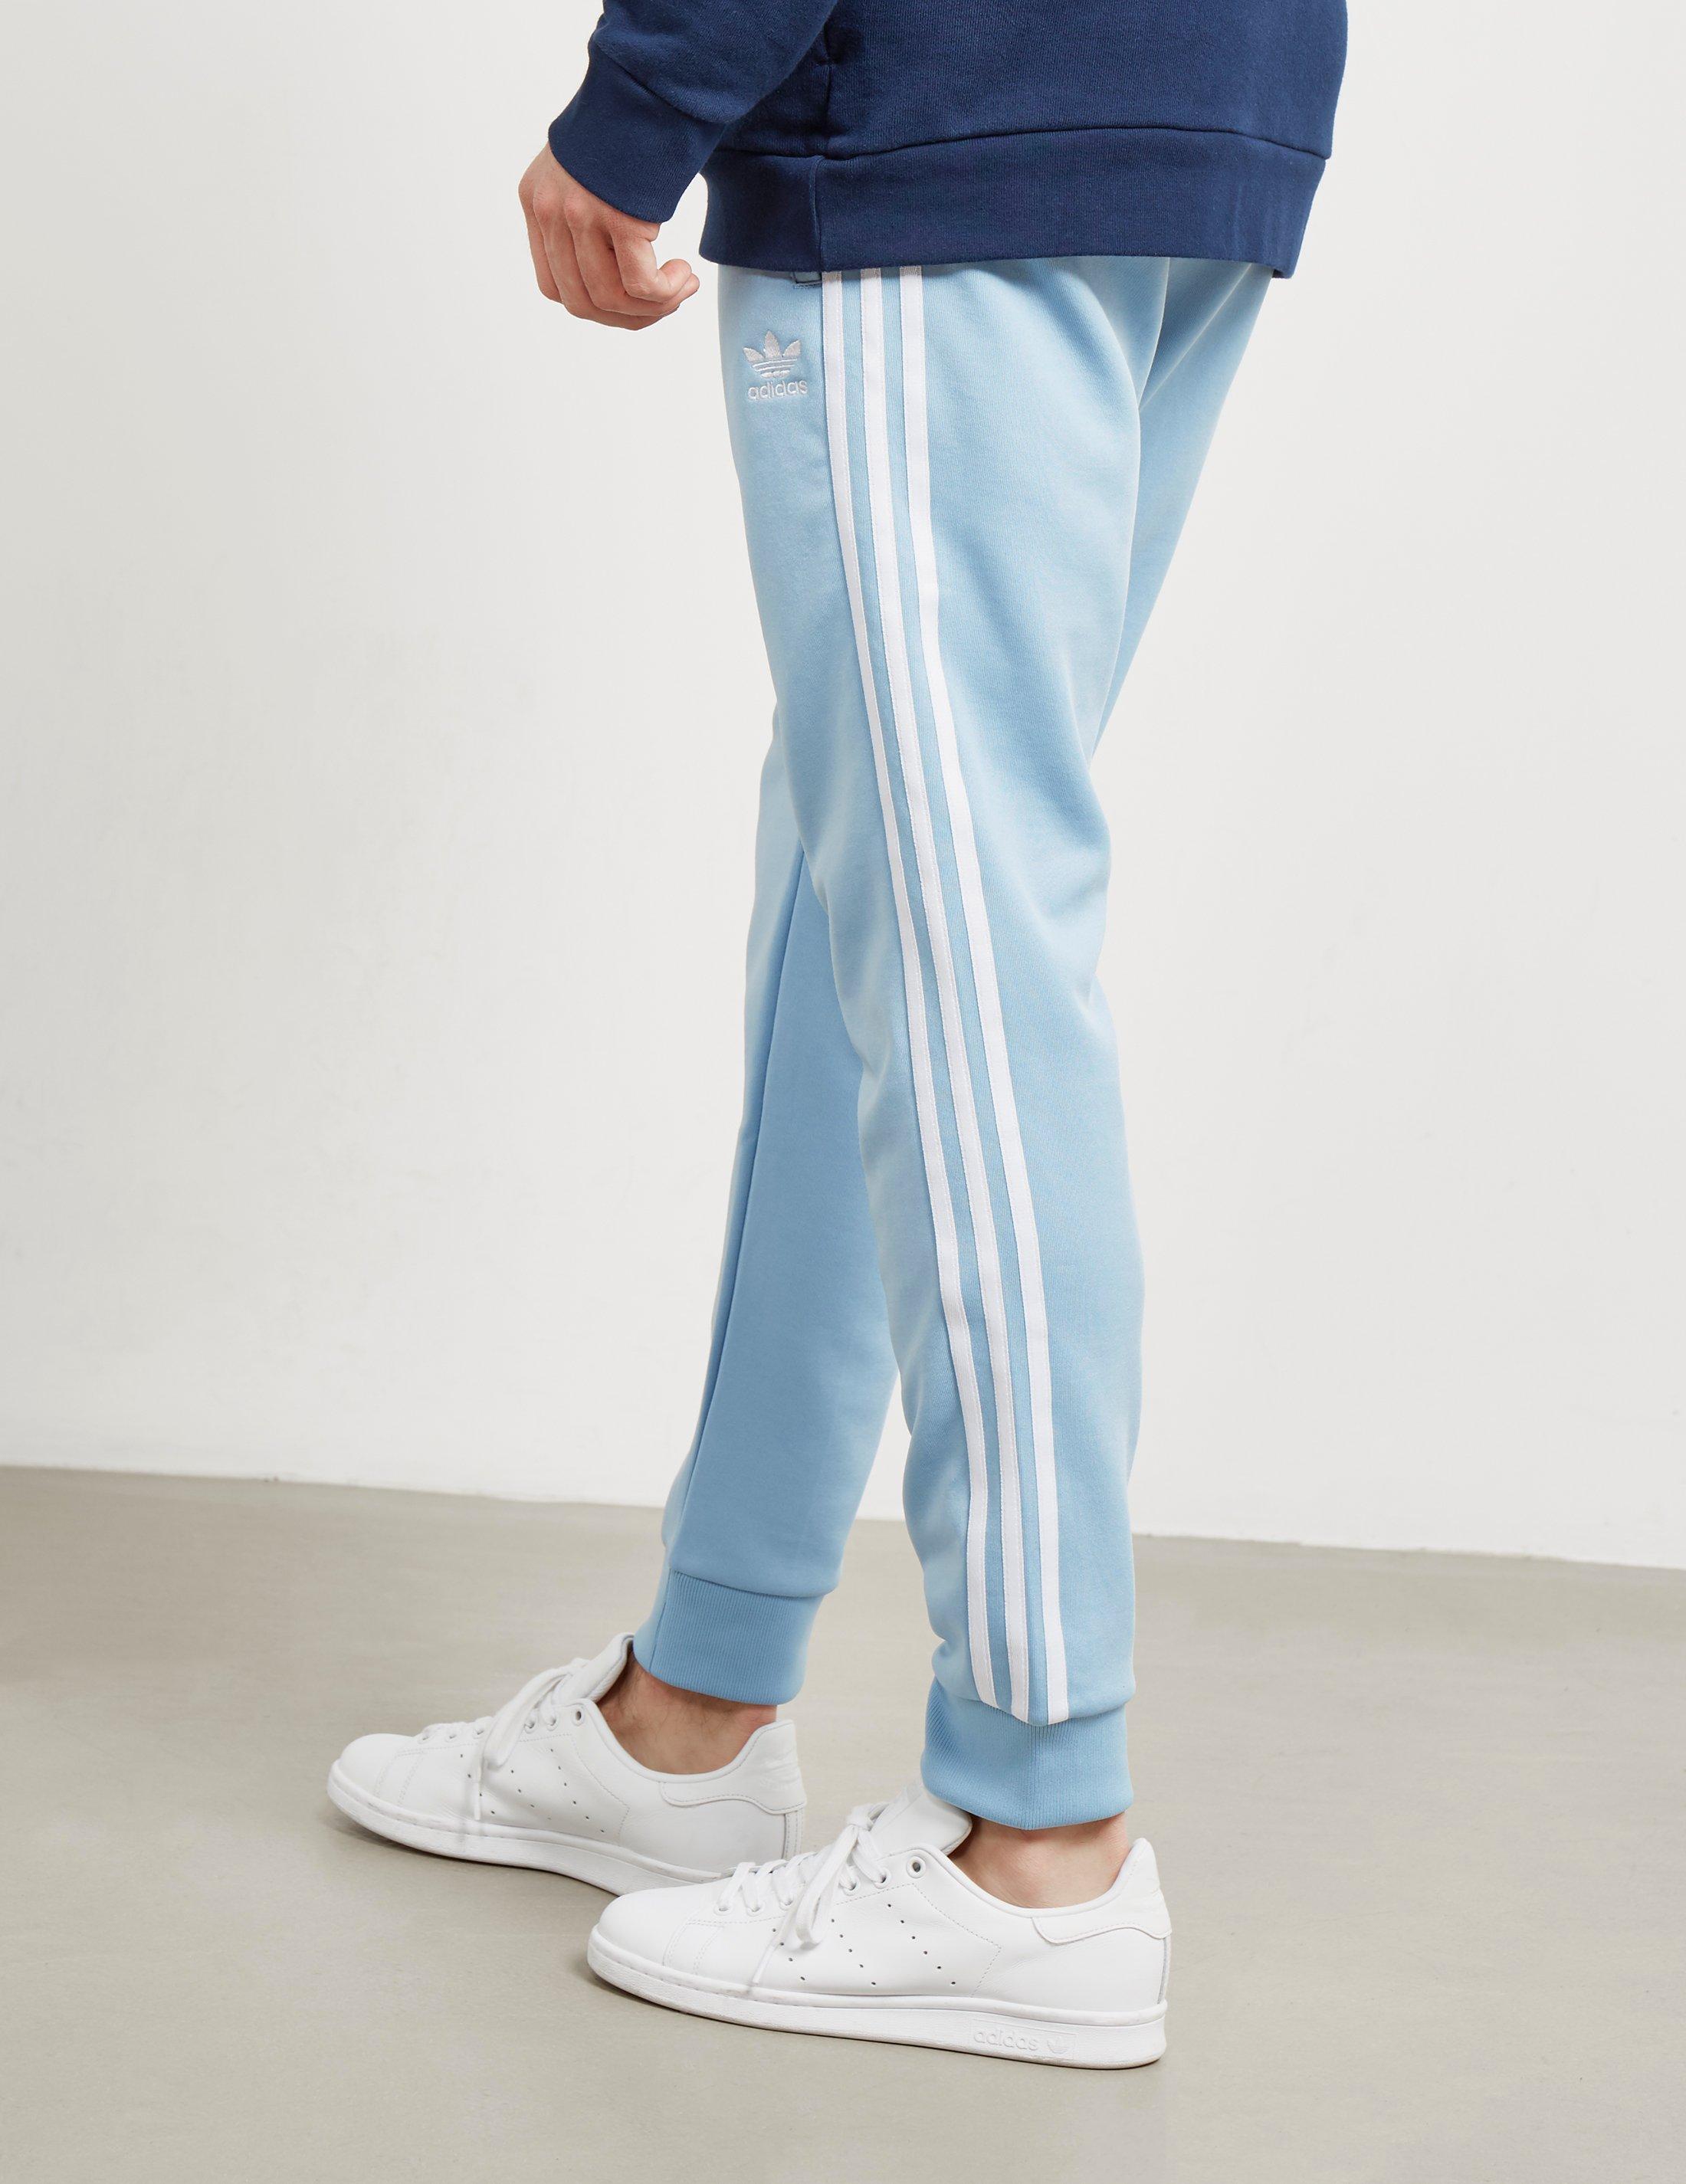 size 40 dc67b 538e5 Adidas Originals Superstar track pants hombre ceniza azul en azul para los  hombres